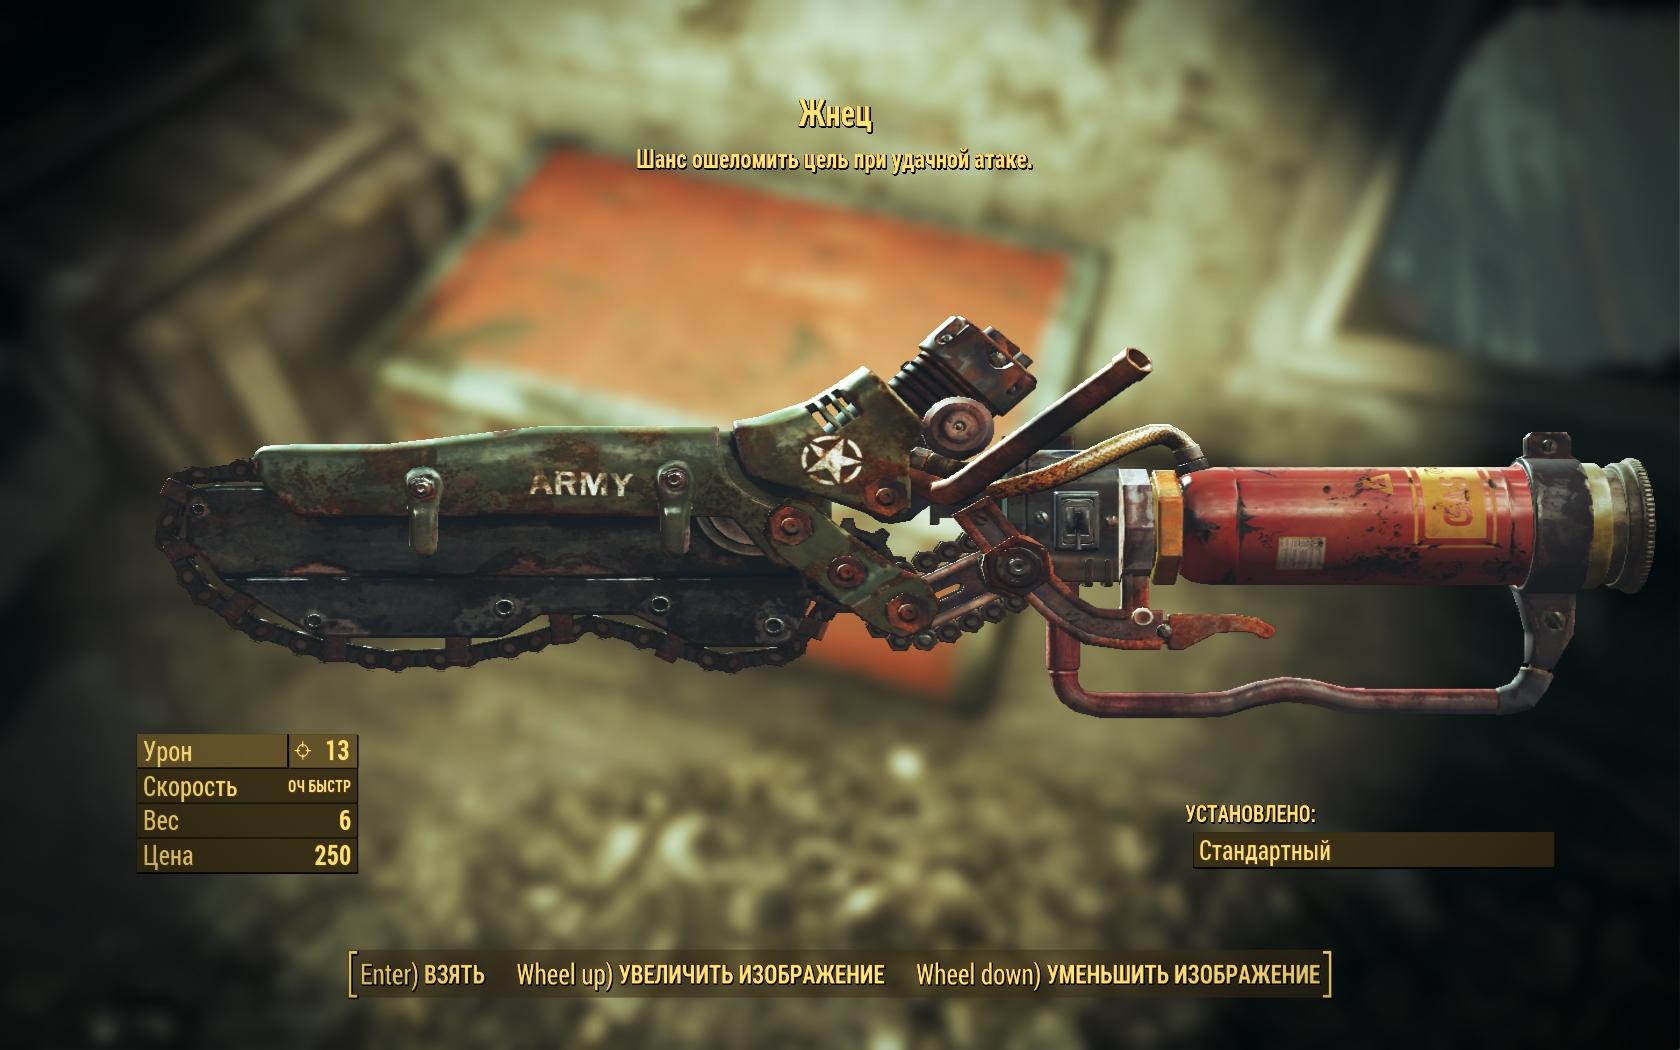 Жнец (Фар-Харбор) - Fallout 4 Жнец, Оружие